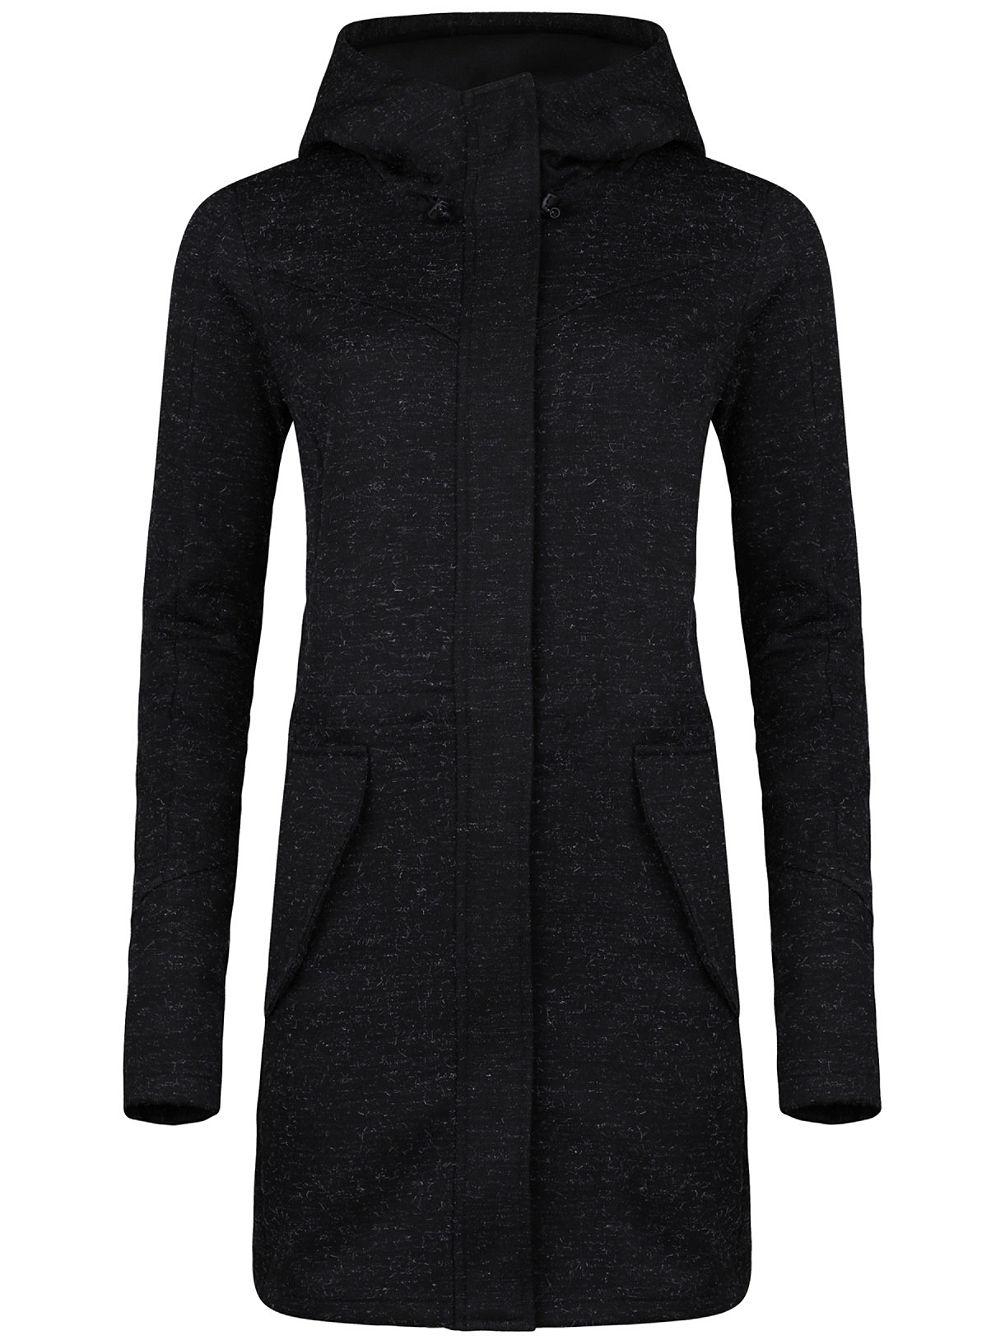 o-neill-river-hyperfleece-jacket